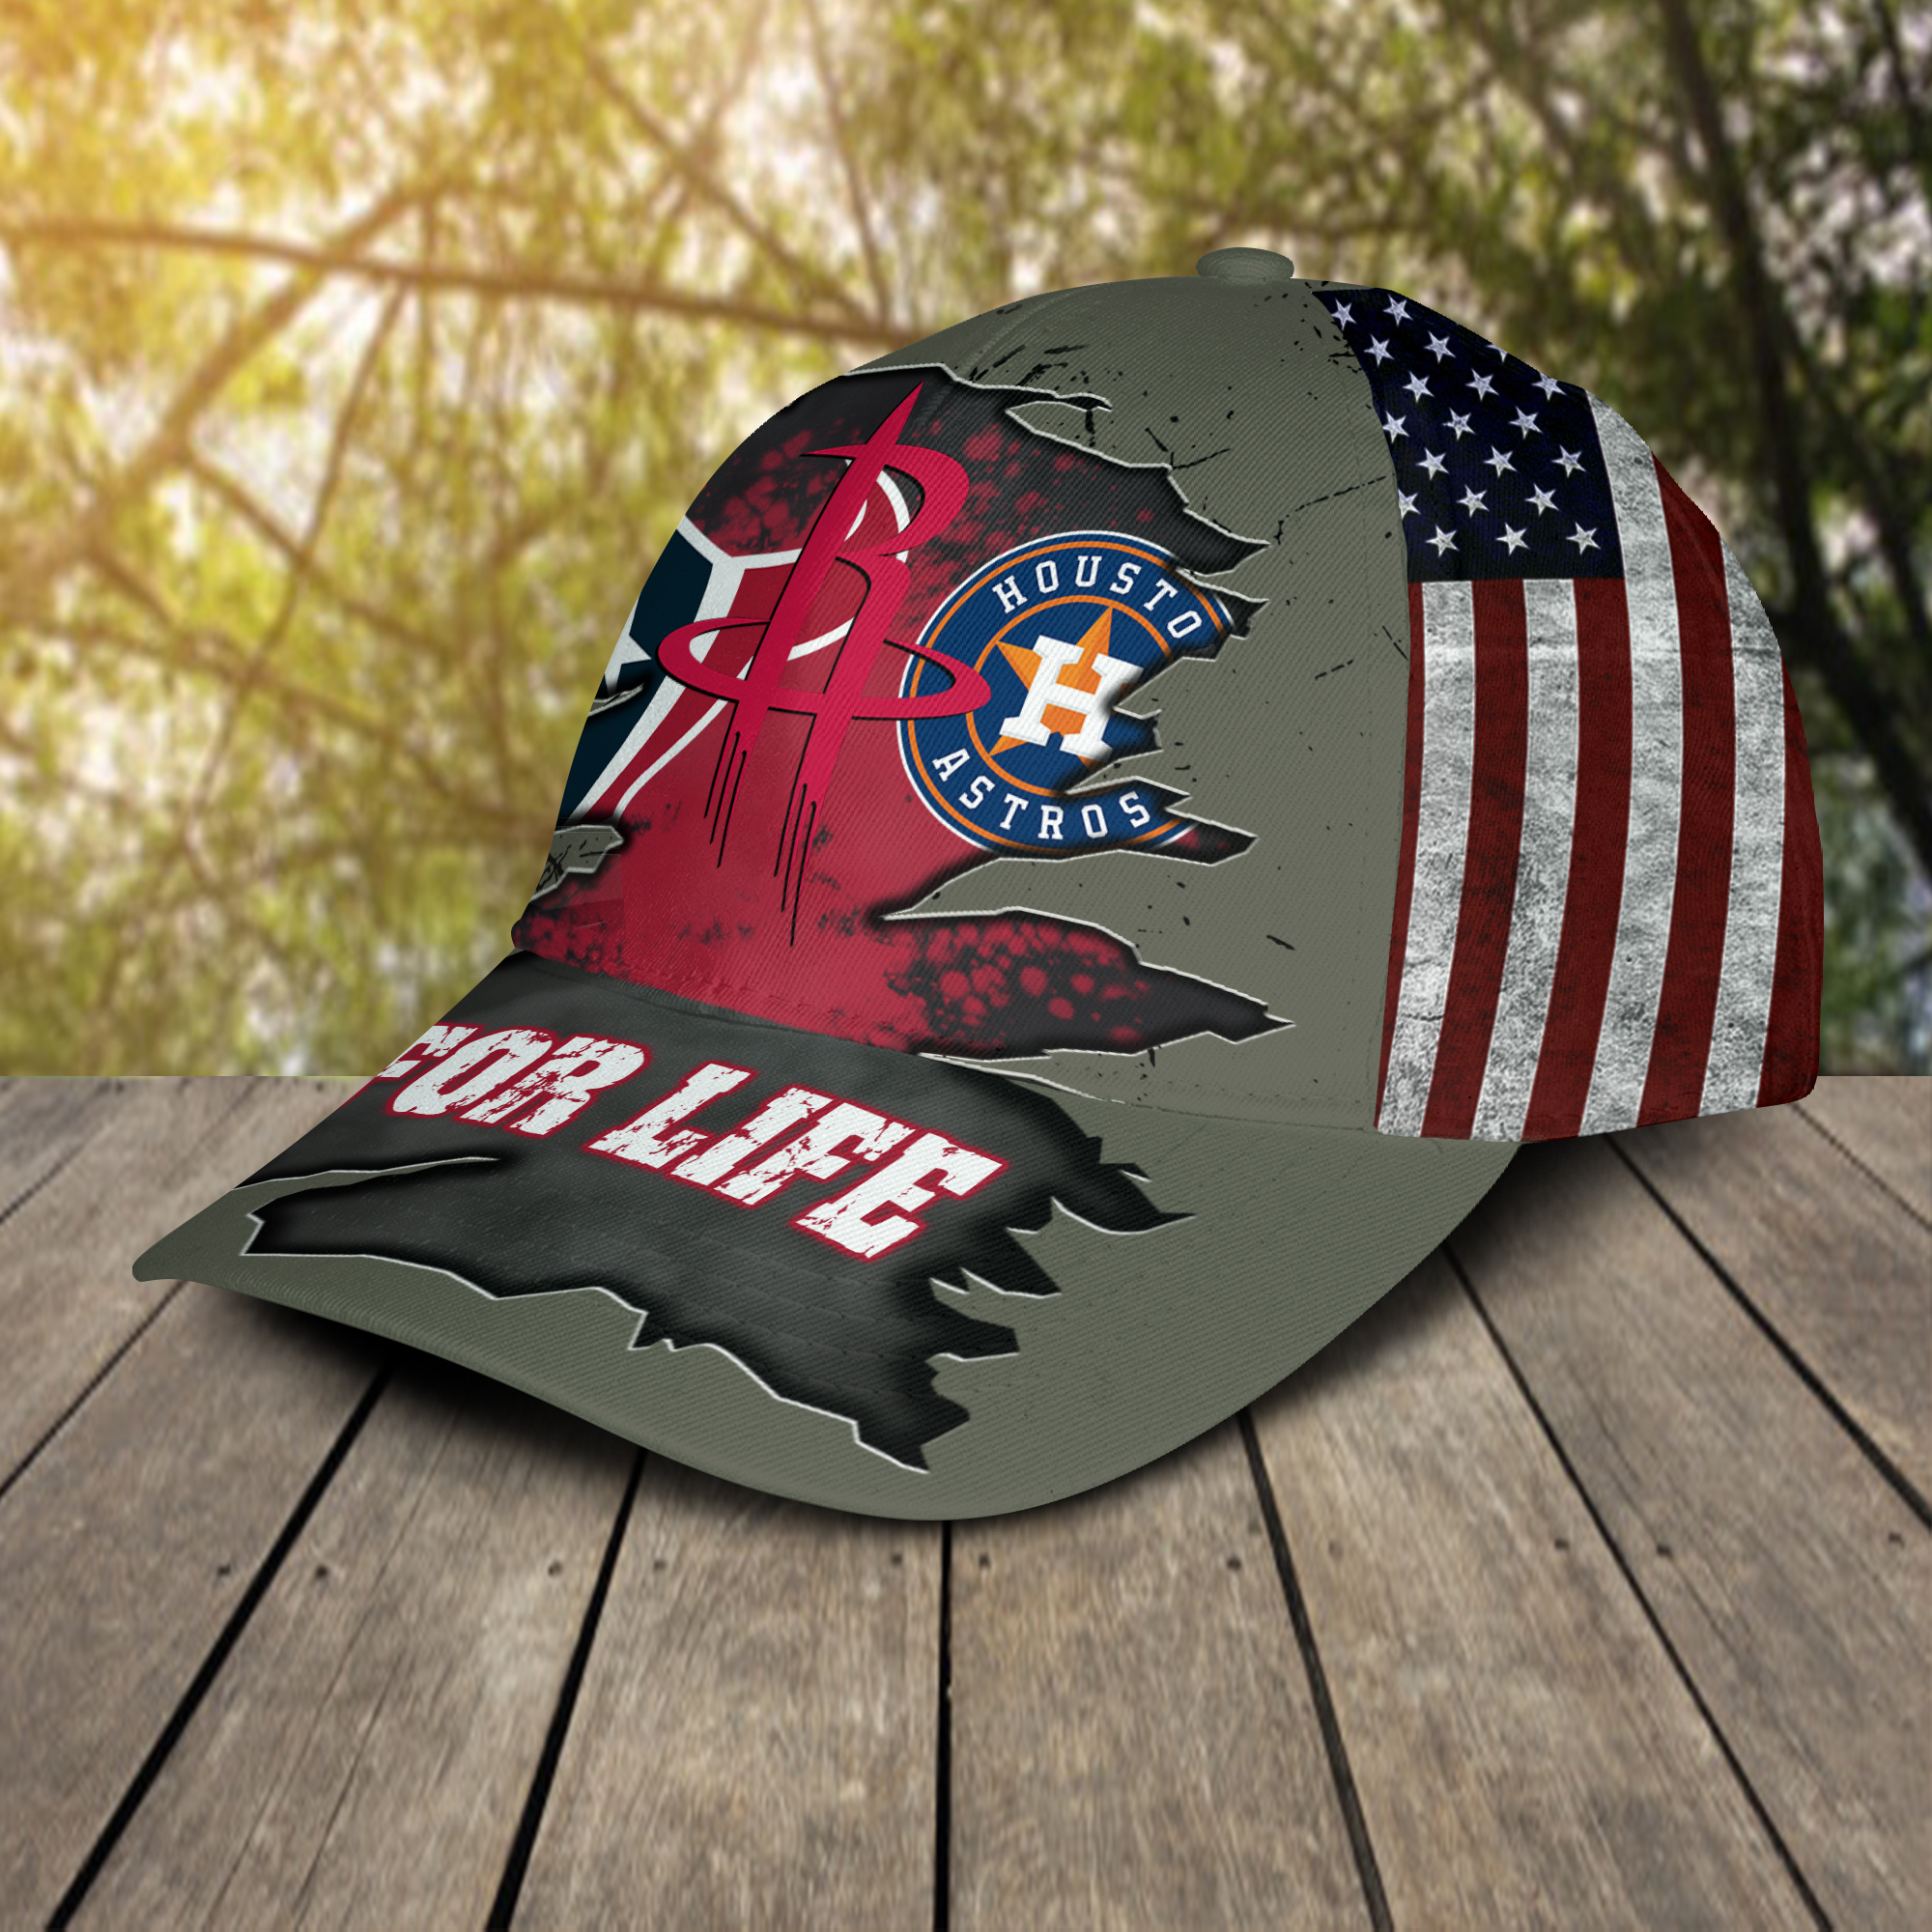 Houston Texans, Houston Astros, Houston Rockets For Life Hat Cap-2